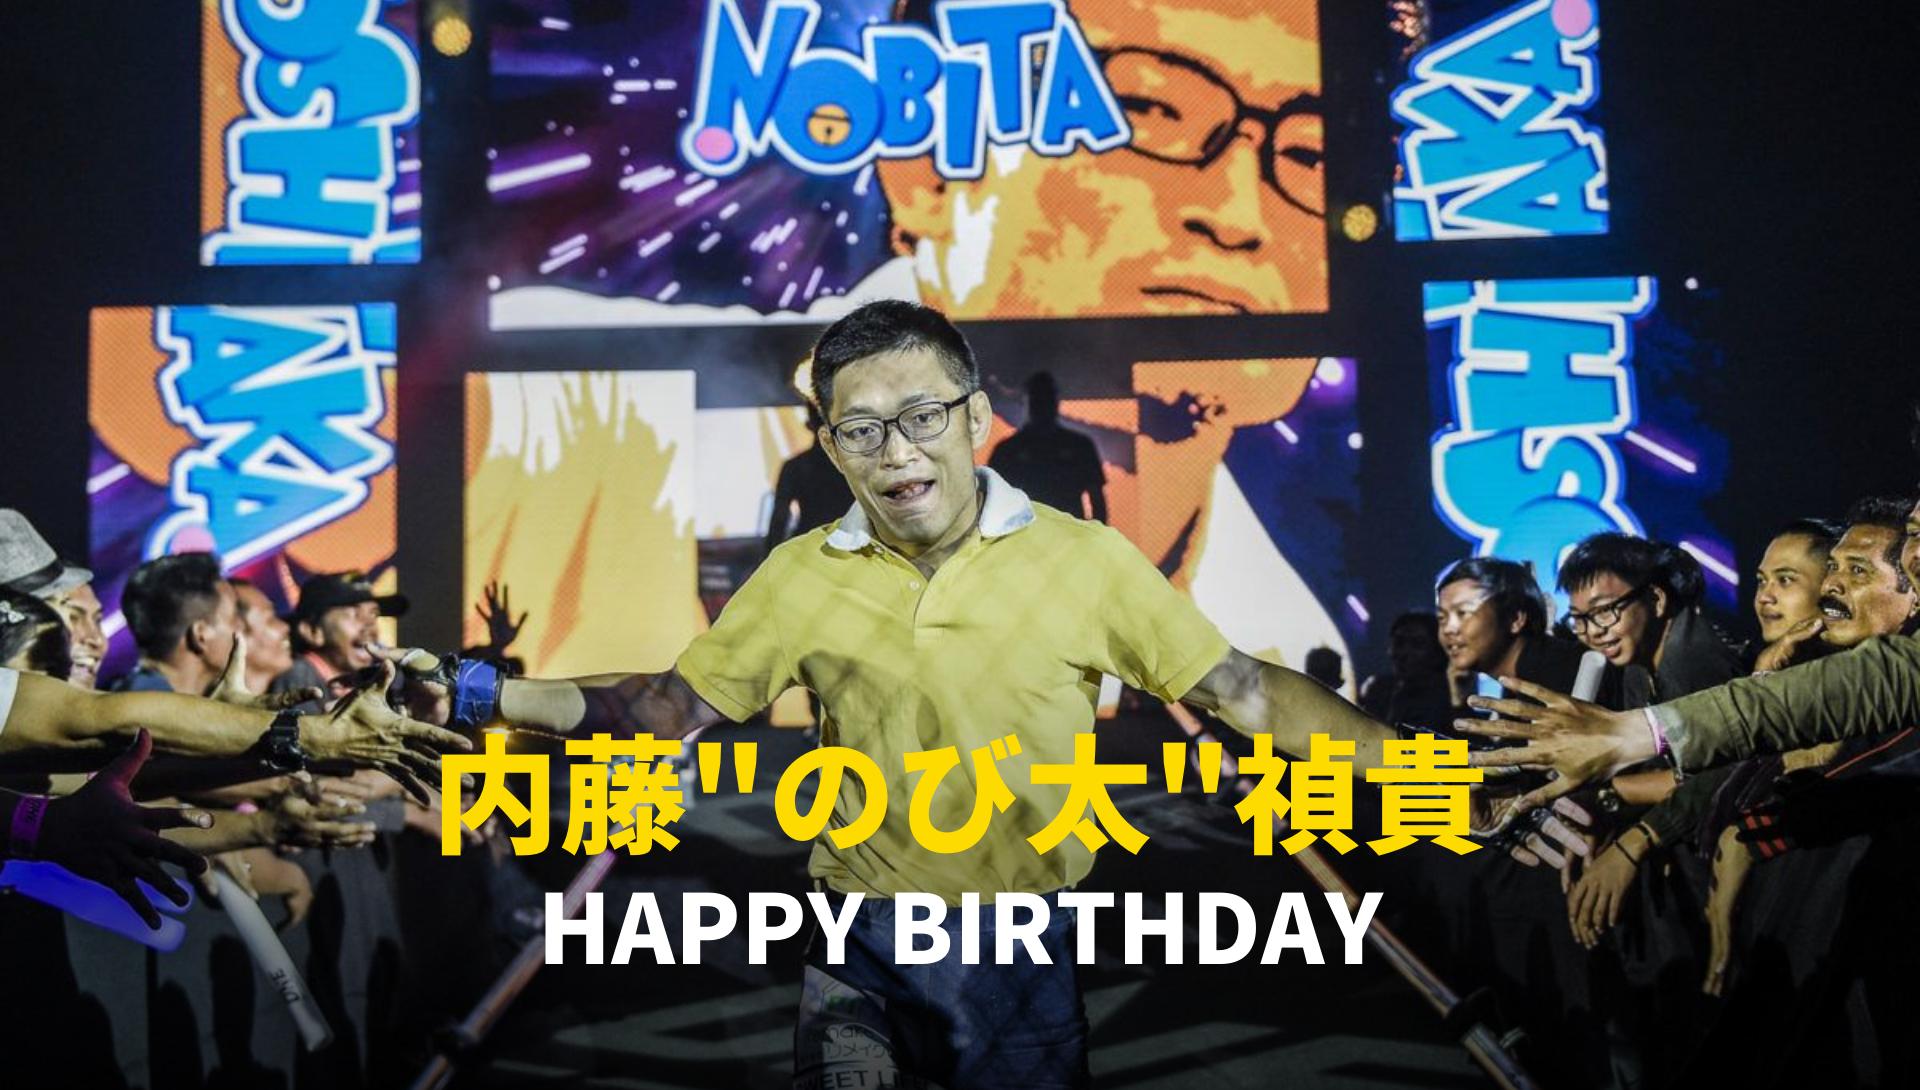 【ONE】元ONEストロー級世界王者 内藤のび太!お誕生日おめでとう!